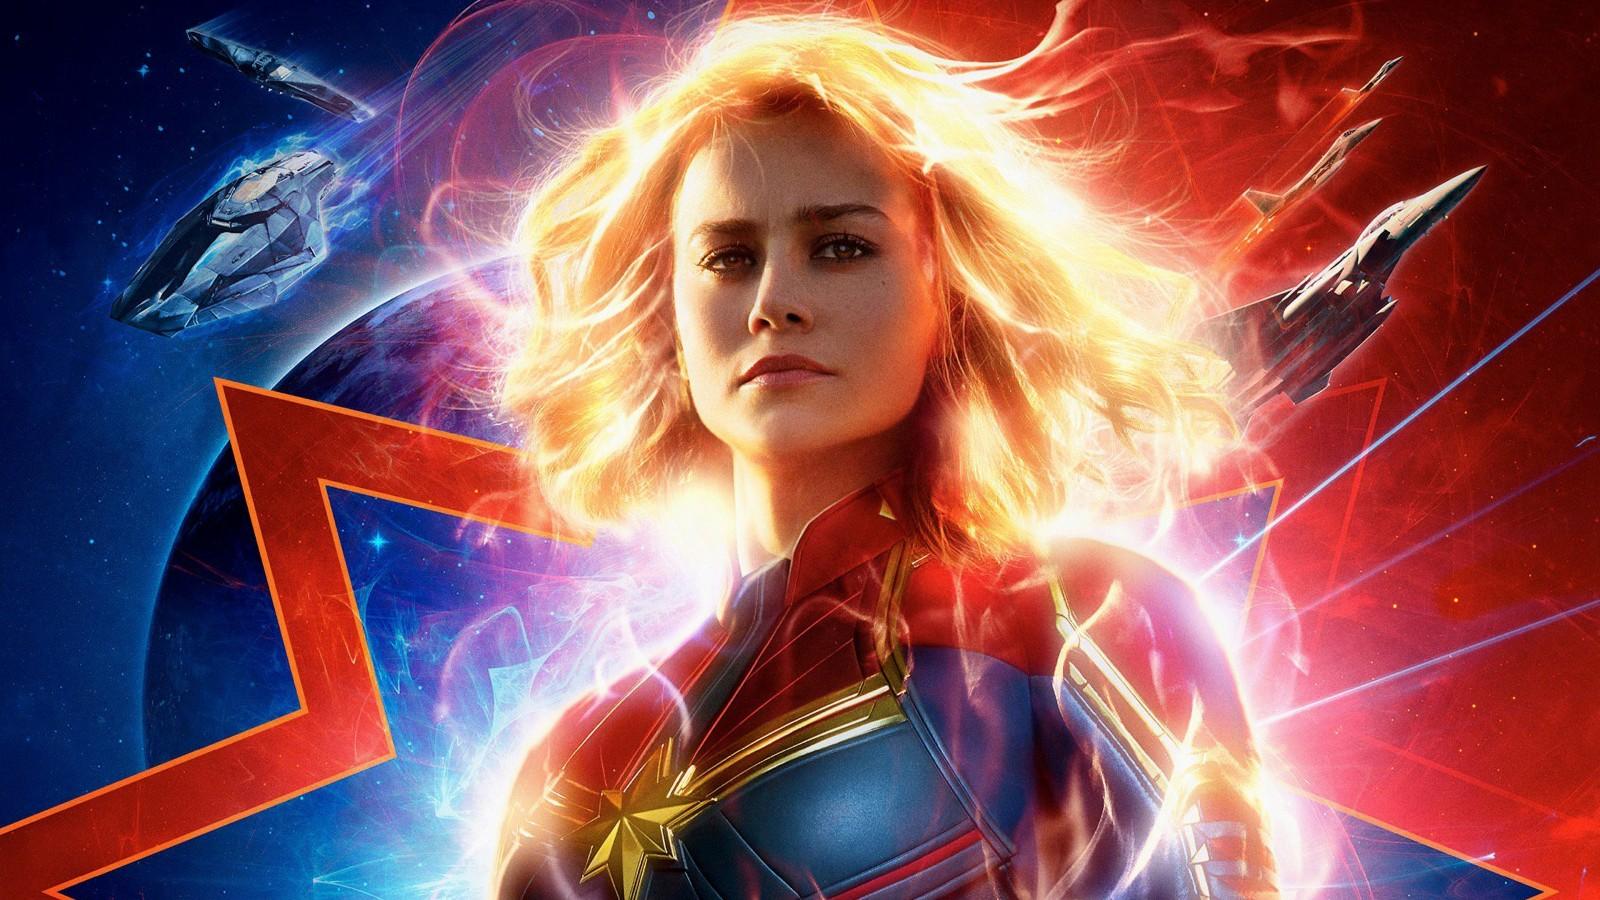 Download Wallpaper Superman 3d Captain Marvel 2019 4k Wallpapers Hd Wallpapers Id 26844